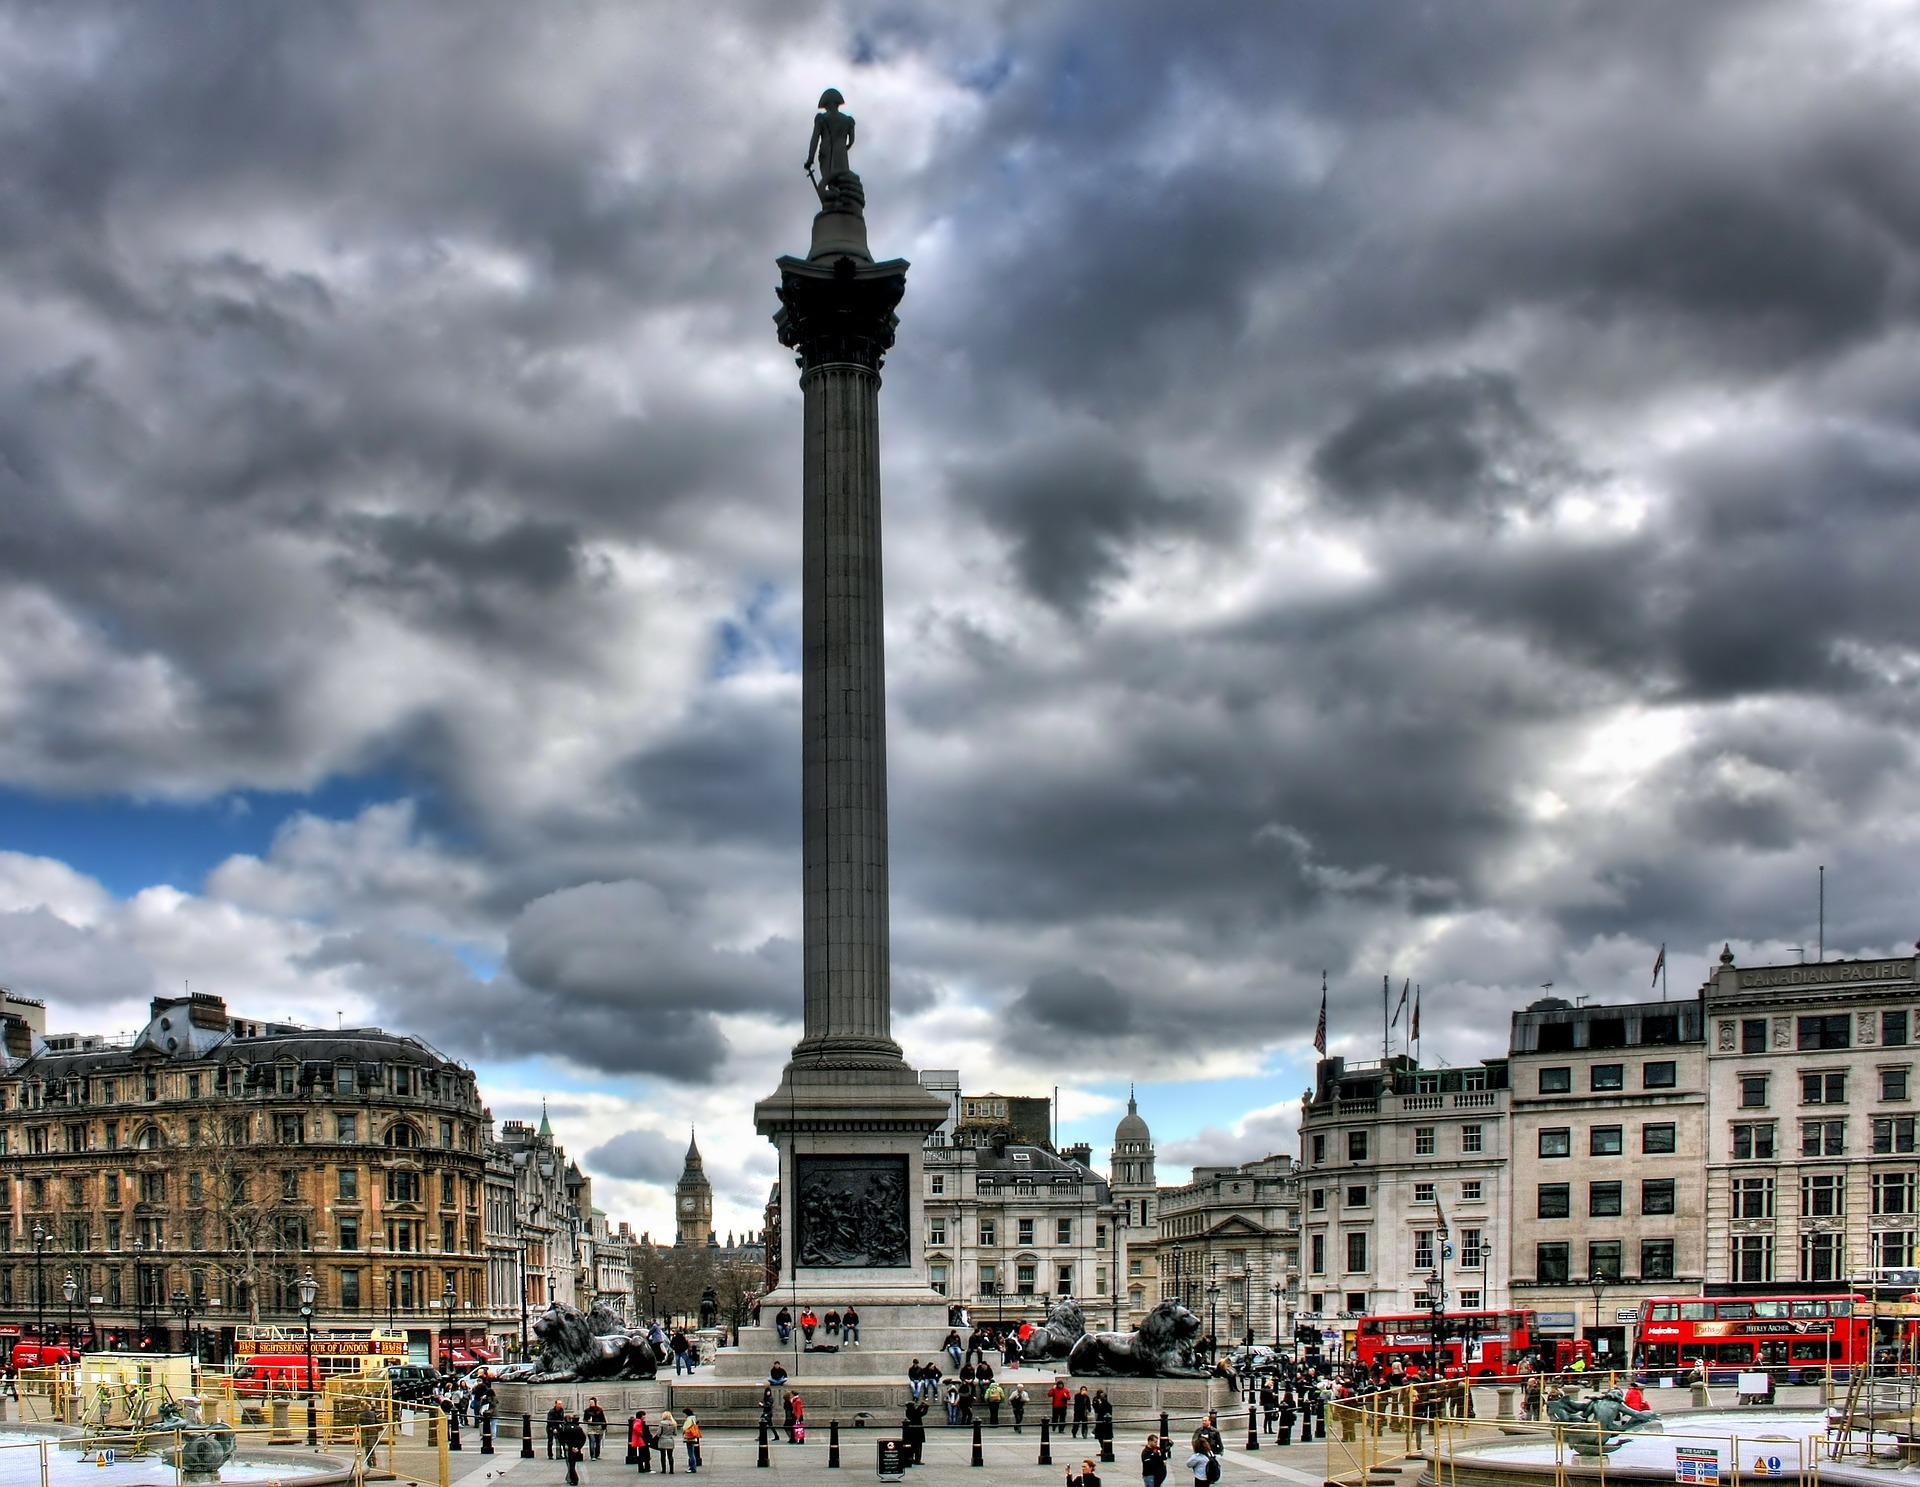 London- Trafalgar Square